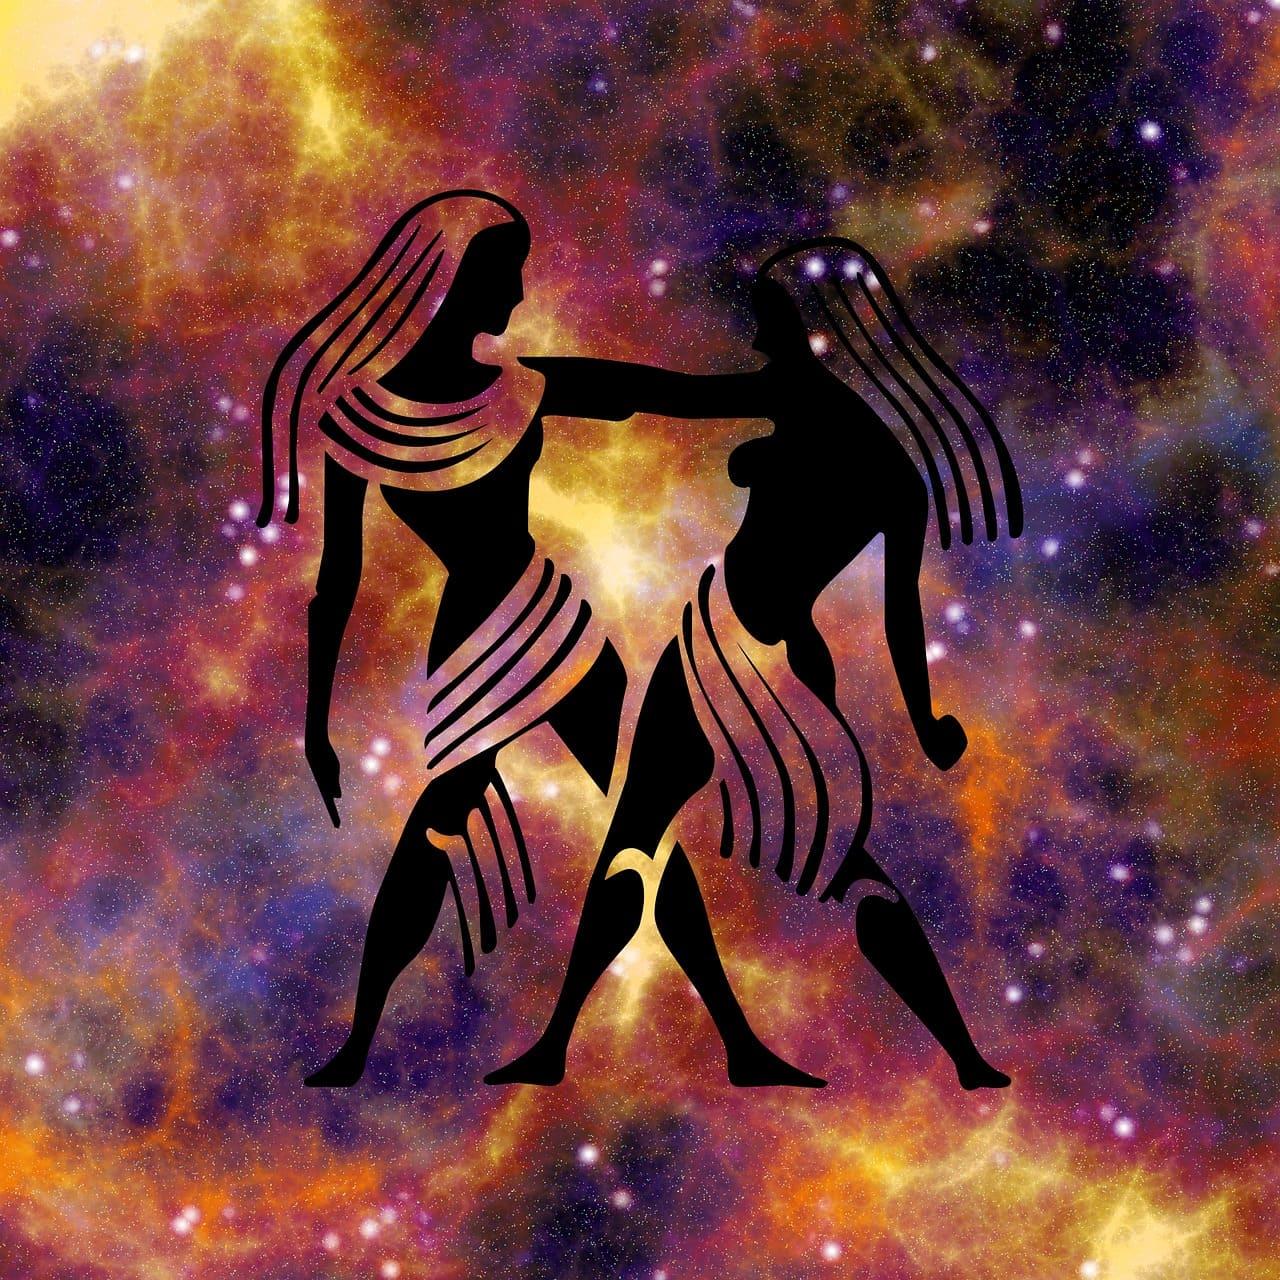 Gemini (Pixabay)